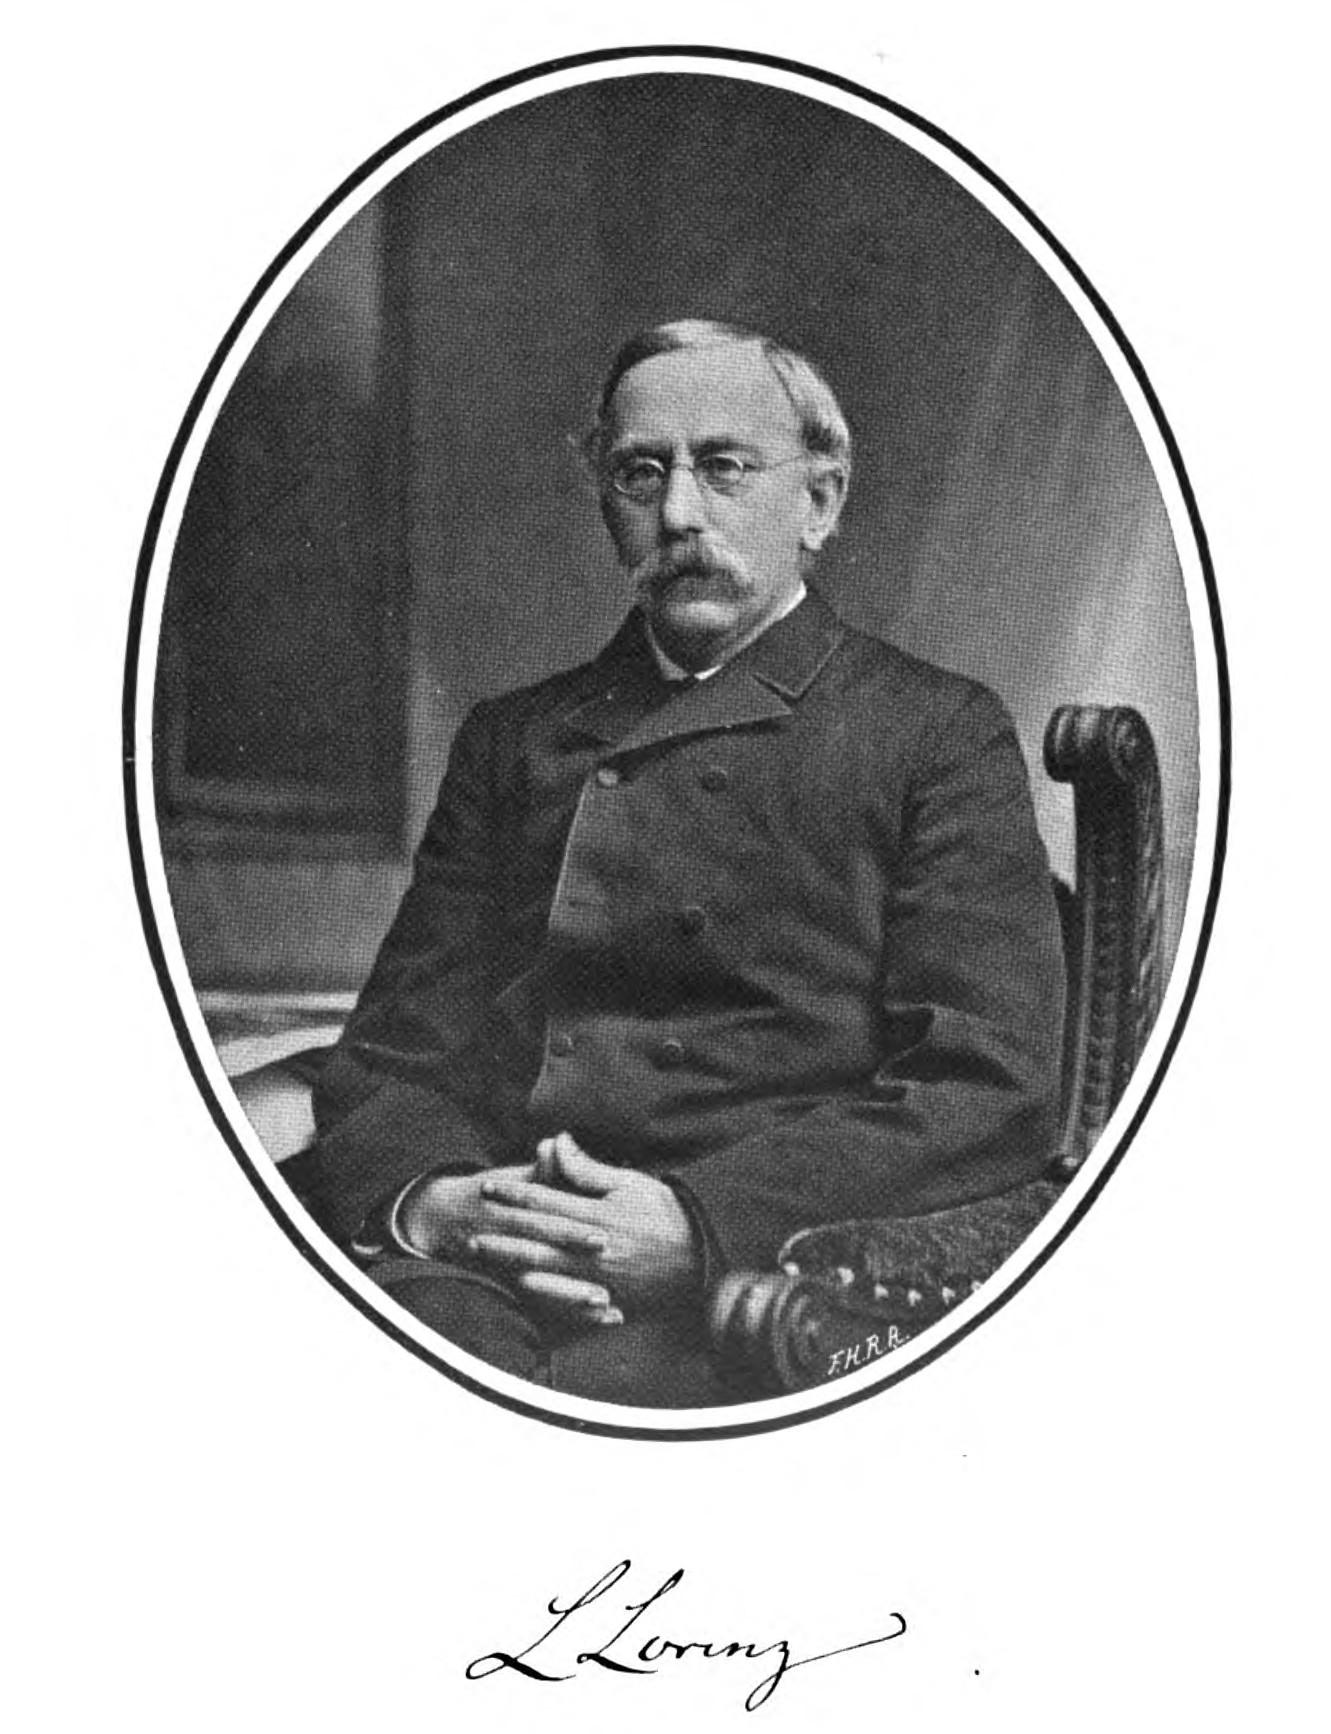 https://upload.wikimedia.org/wikipedia/commons/0/0d/Ludvig_Valentin_Lorenz.jpg